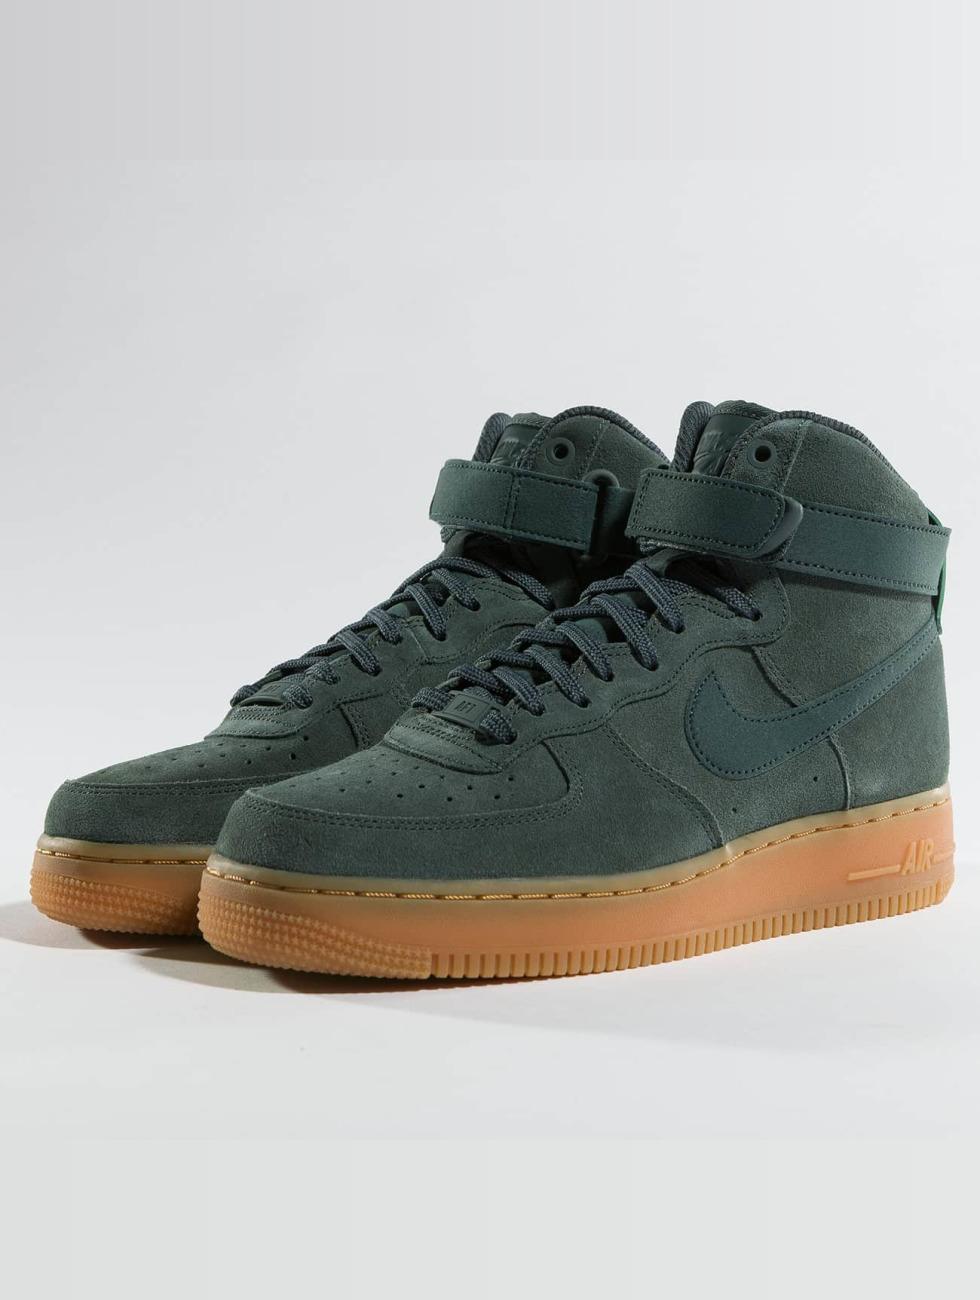 Nike schoen / sneaker Air Force 1 High '07 LV8 in groen 364977 Verhandelbare Goedkope Prijs SEmy3FQP